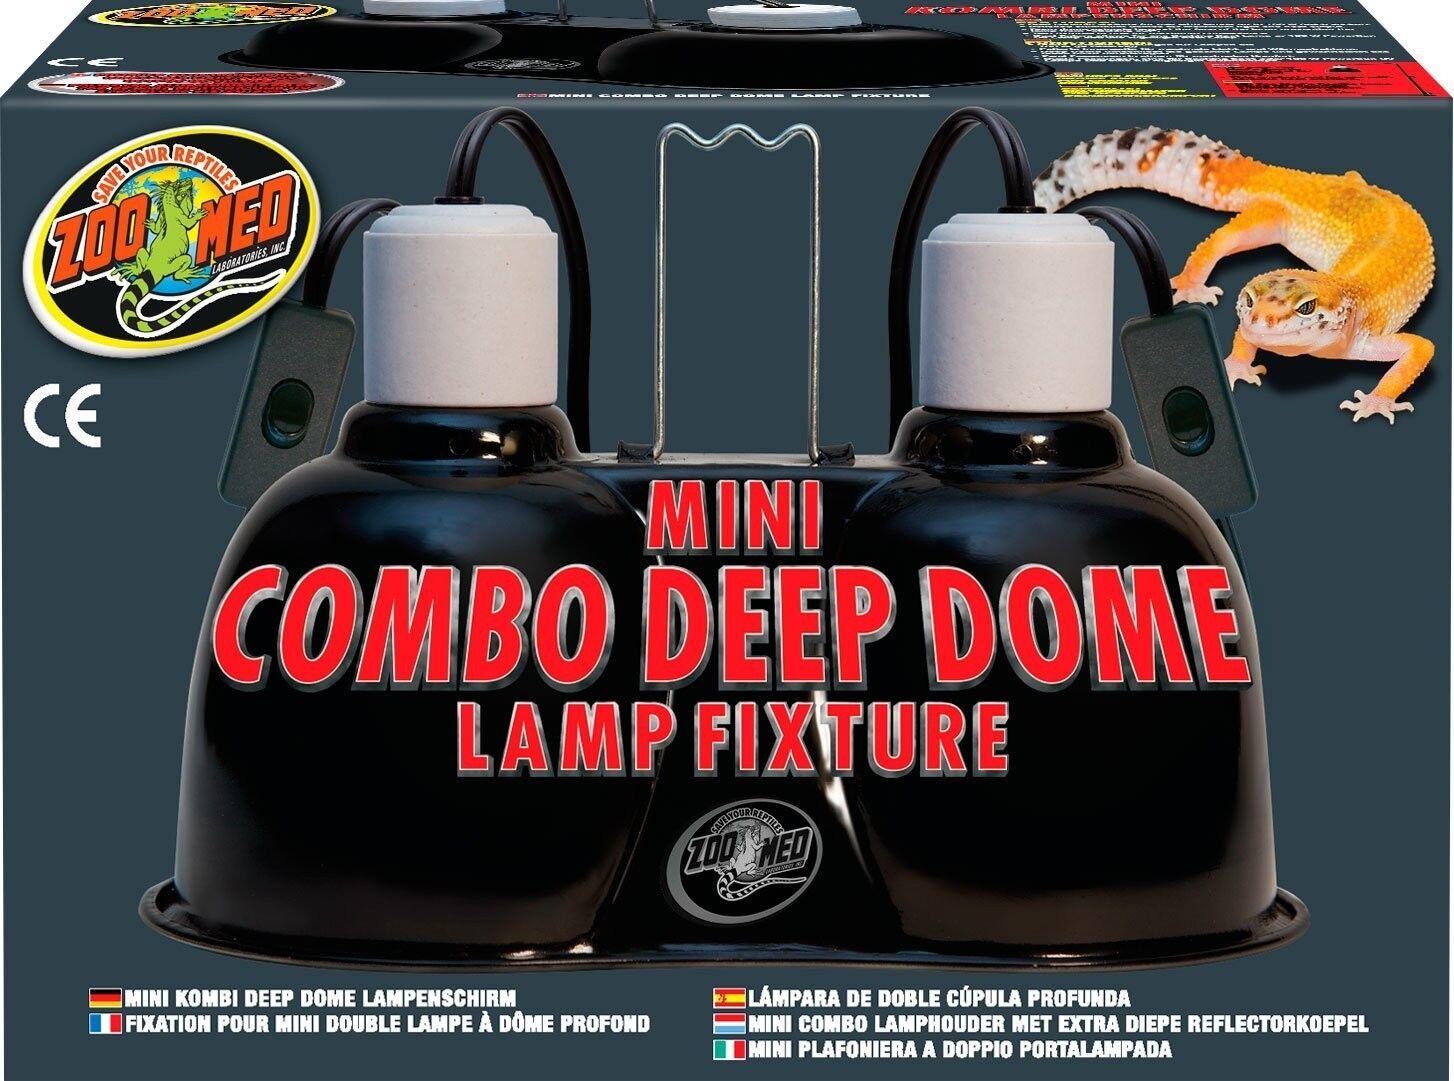 Zoo Med Mini Combo Deep Dome Lamp Fixture Black | eBay